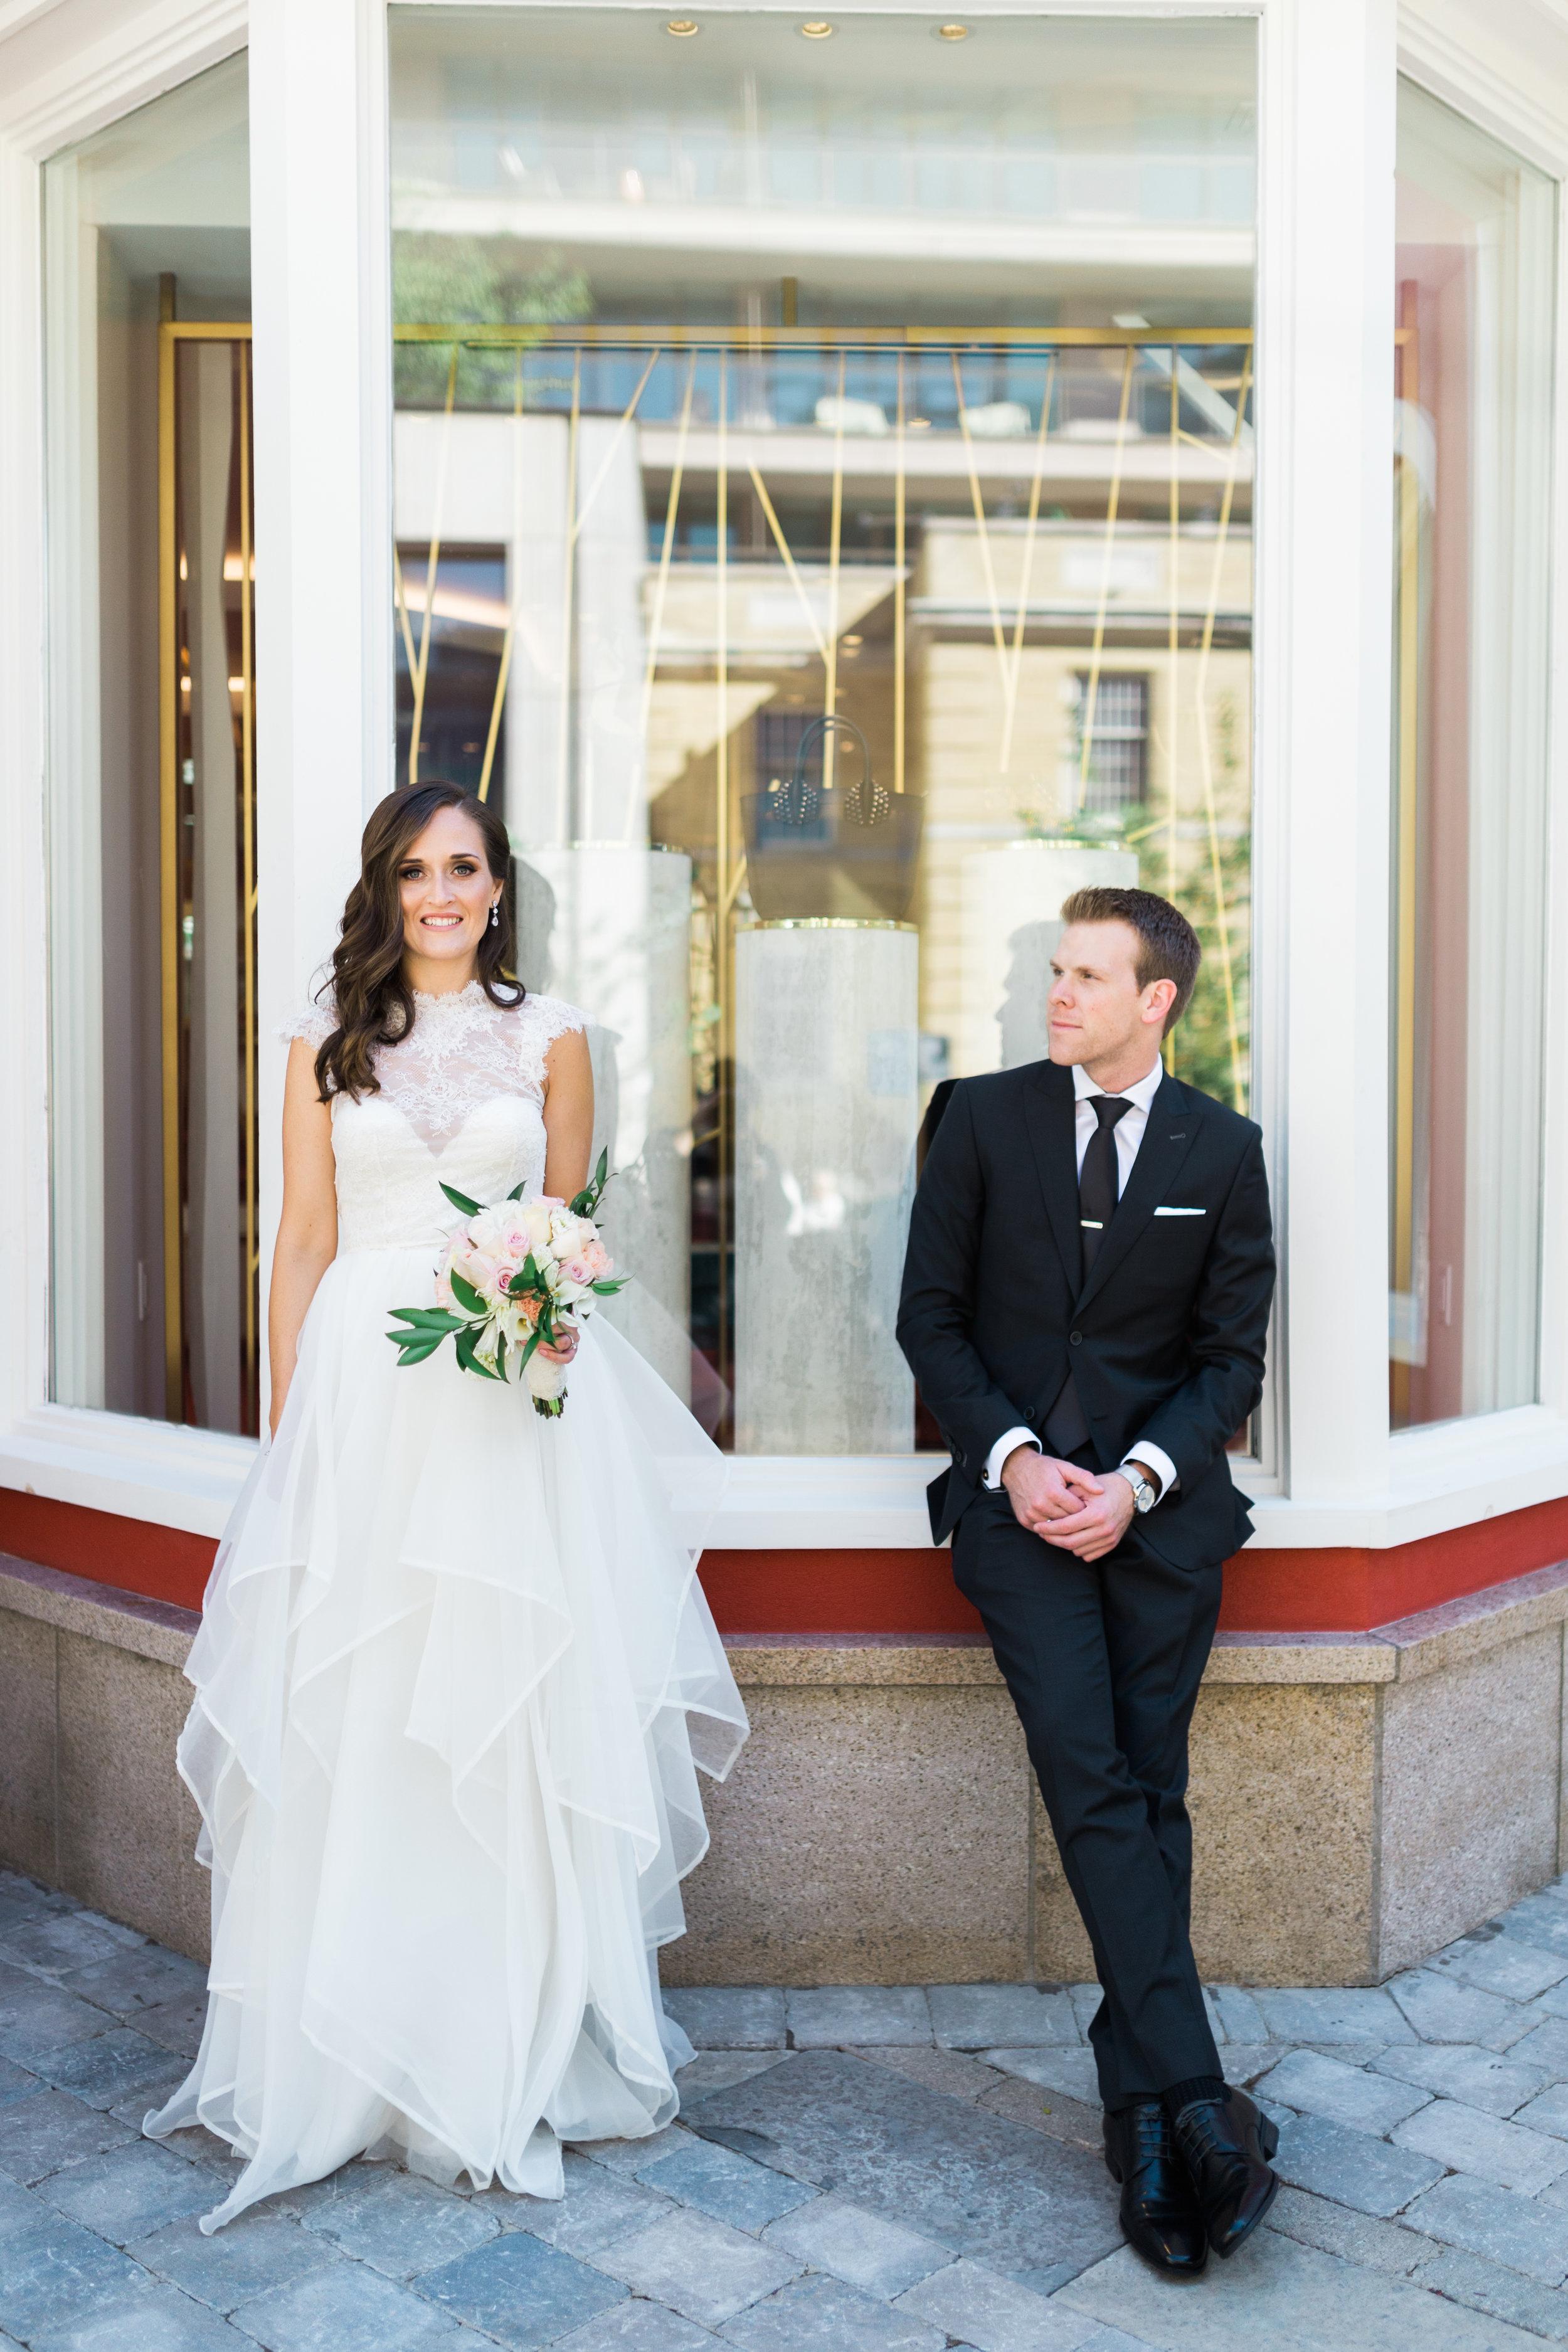 Toronto Fine Art Photographer - Yorkville Wedding - Bride & Groom Portraits-16.jpg